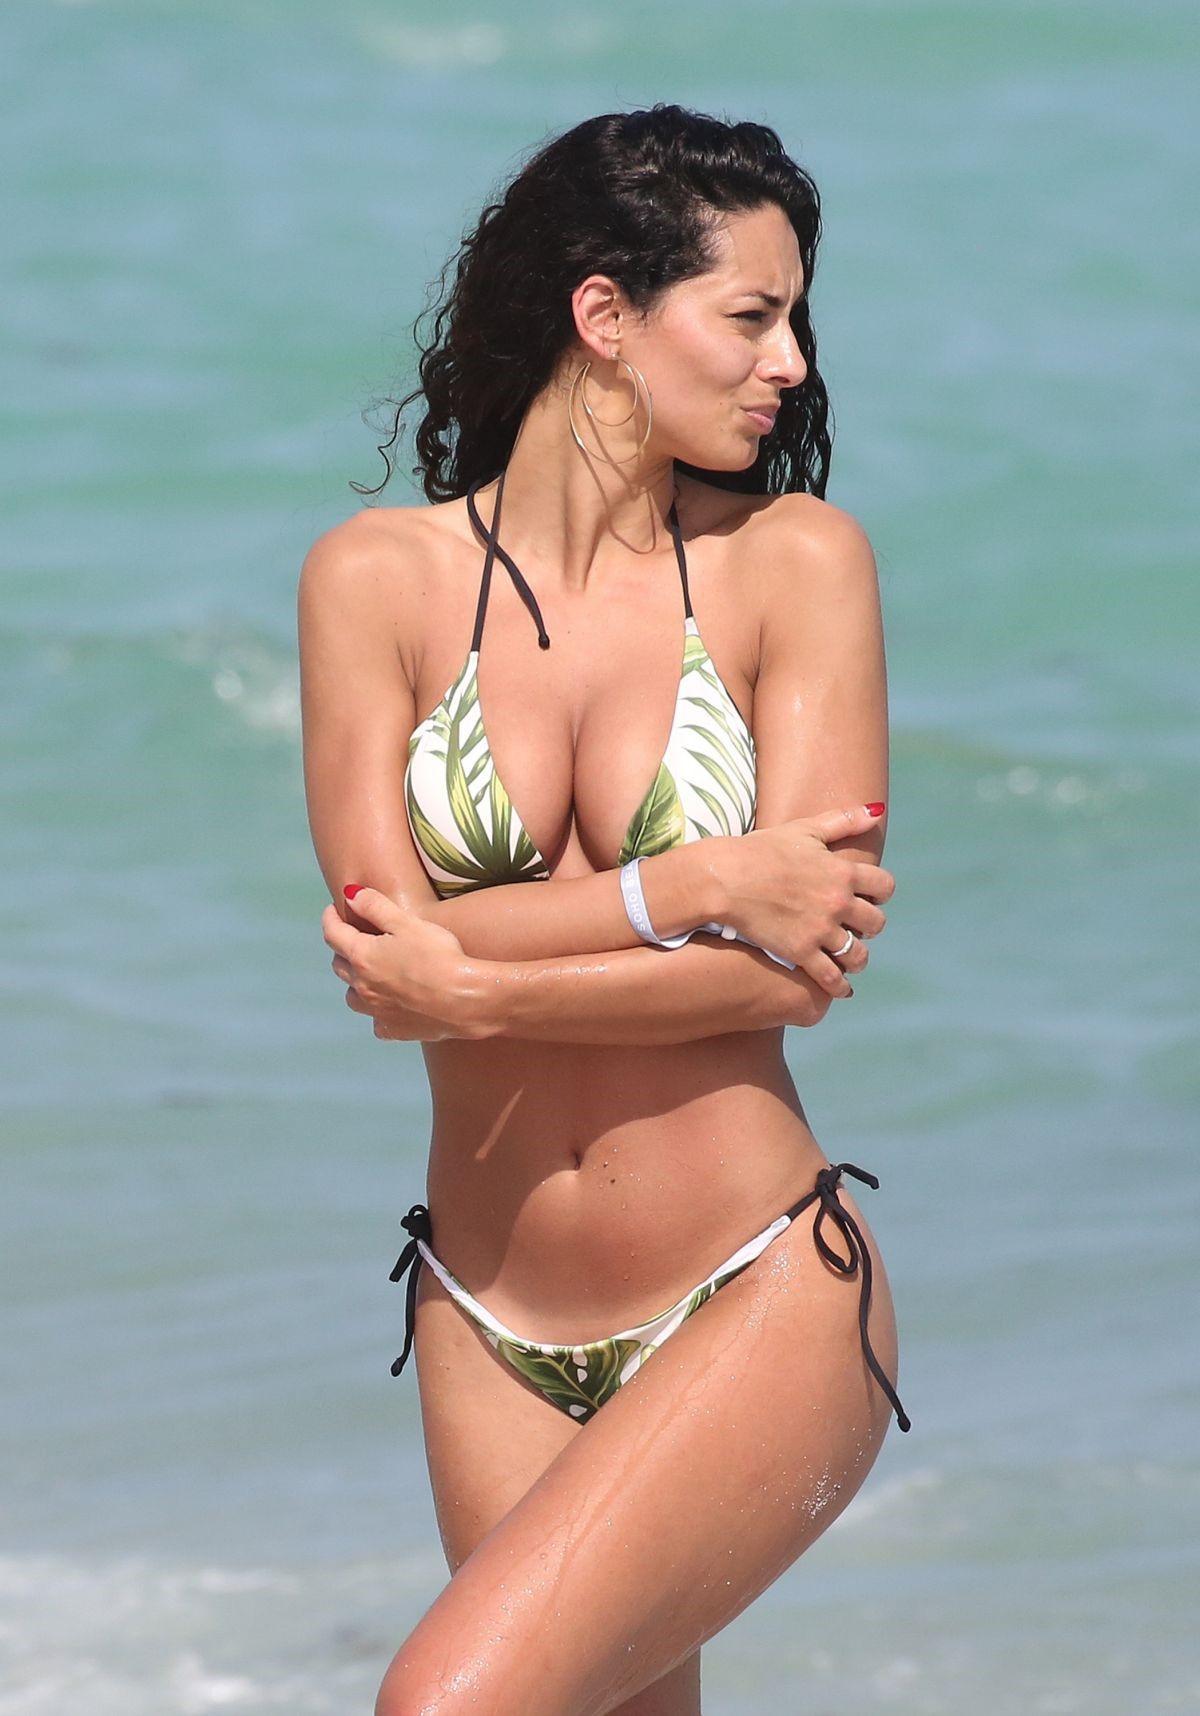 Raffaella Modugno Bikini Photos